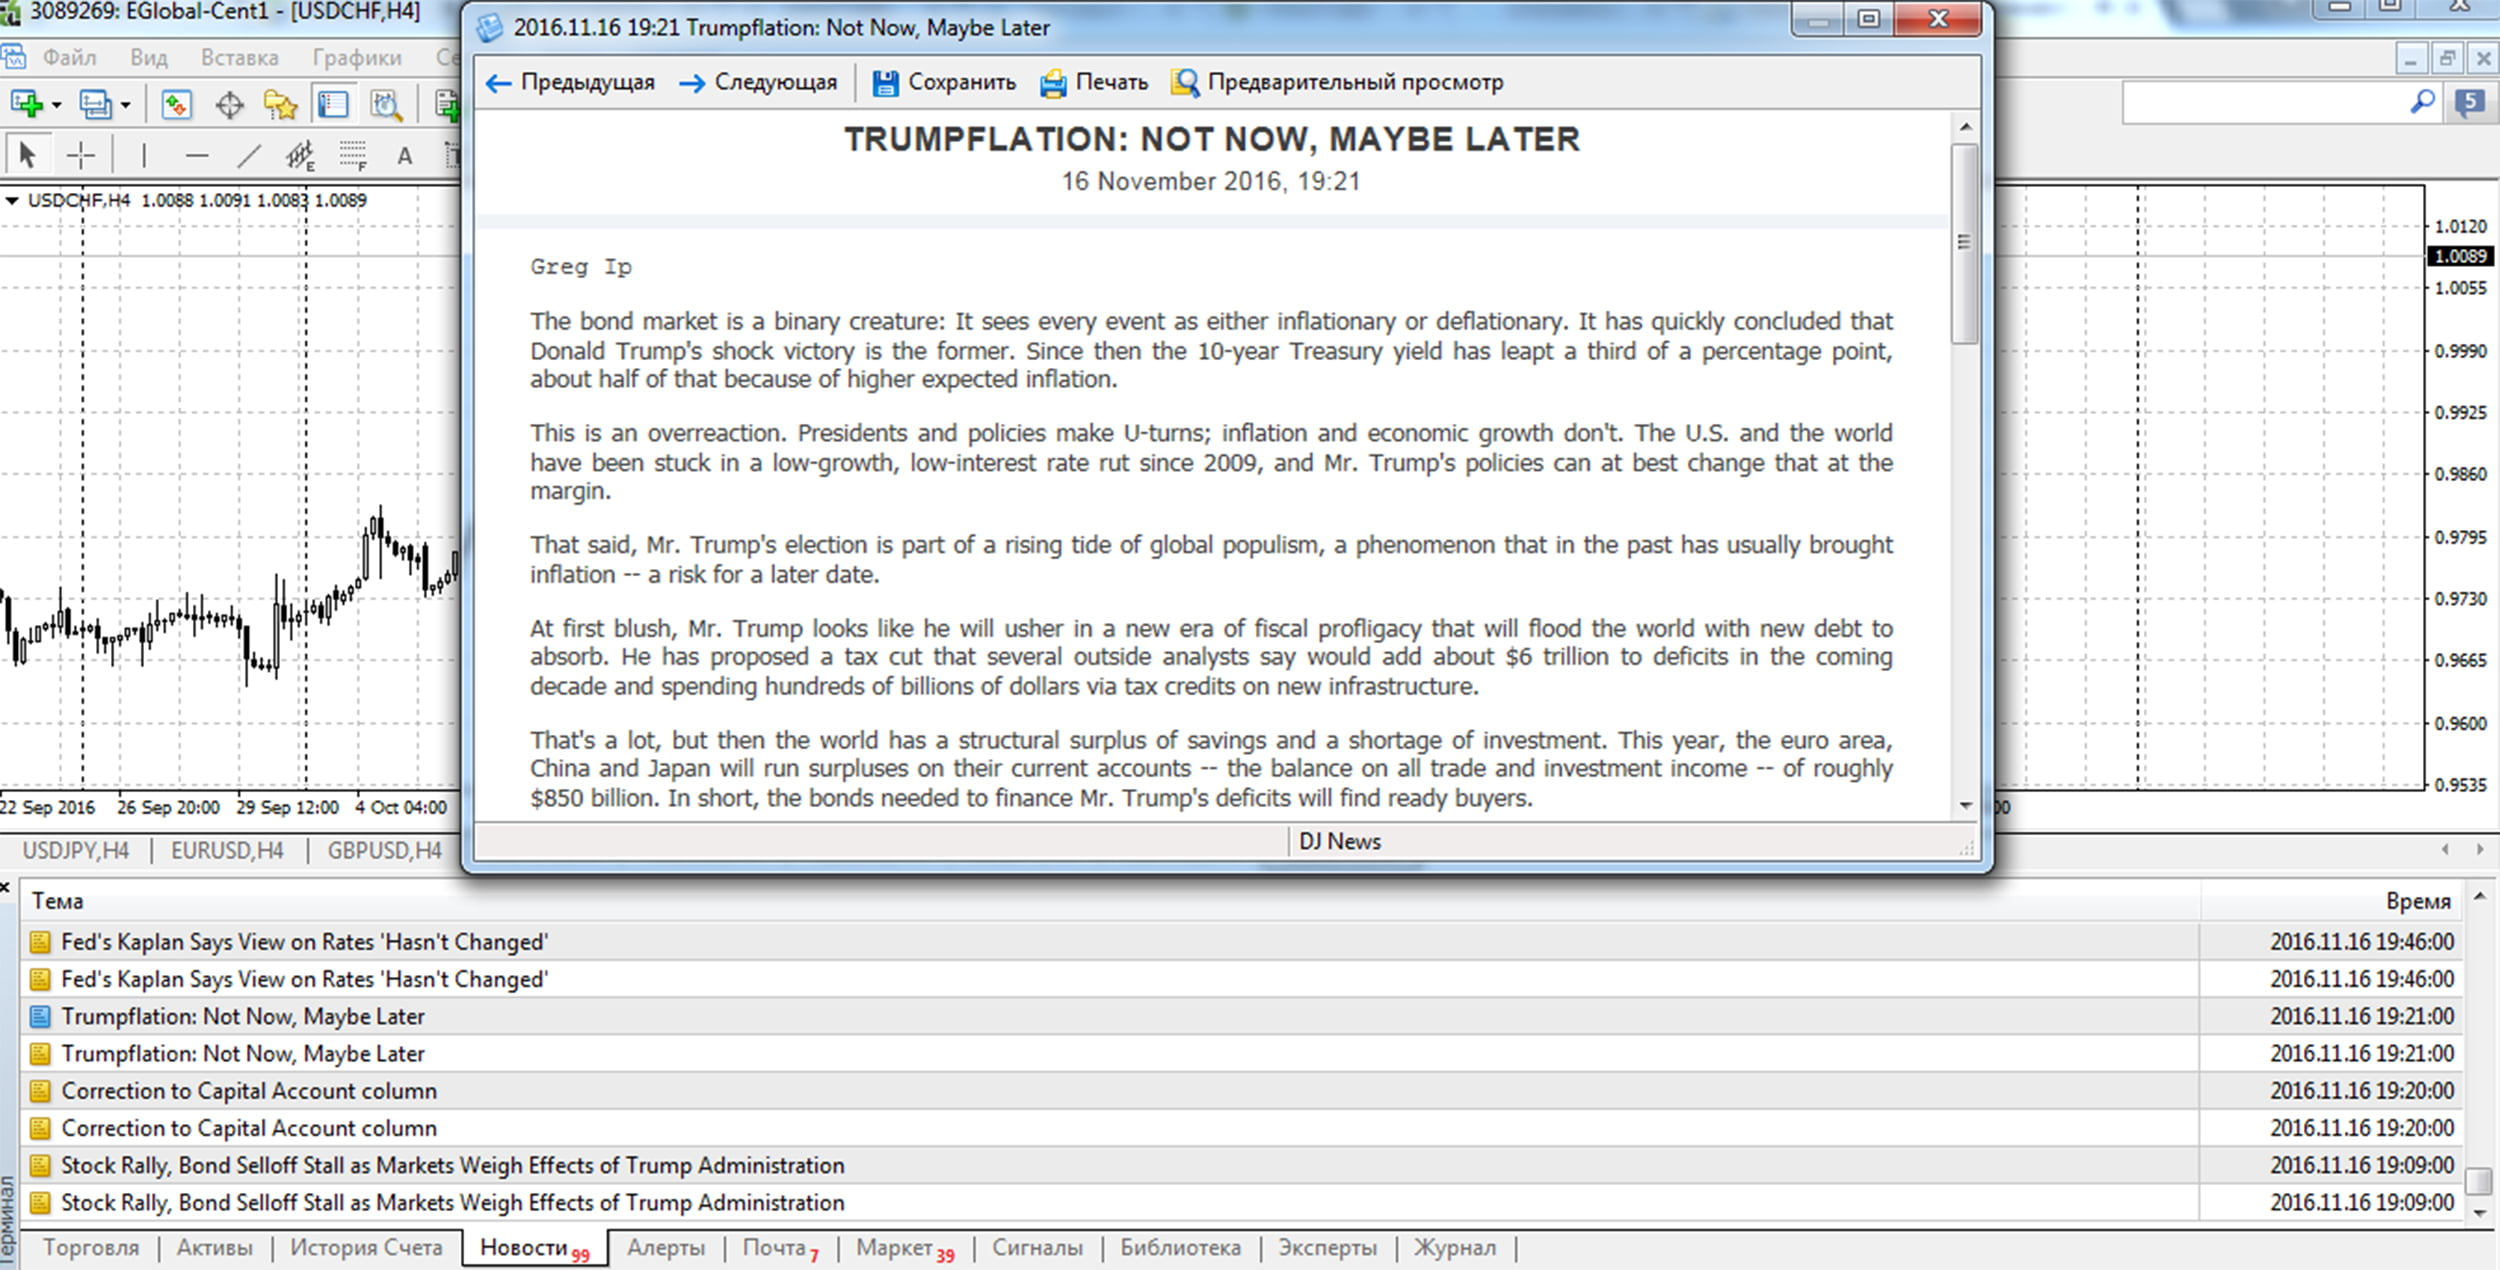 Новости forex аналитика форекс скачать бесплатно книгу forex для дураков